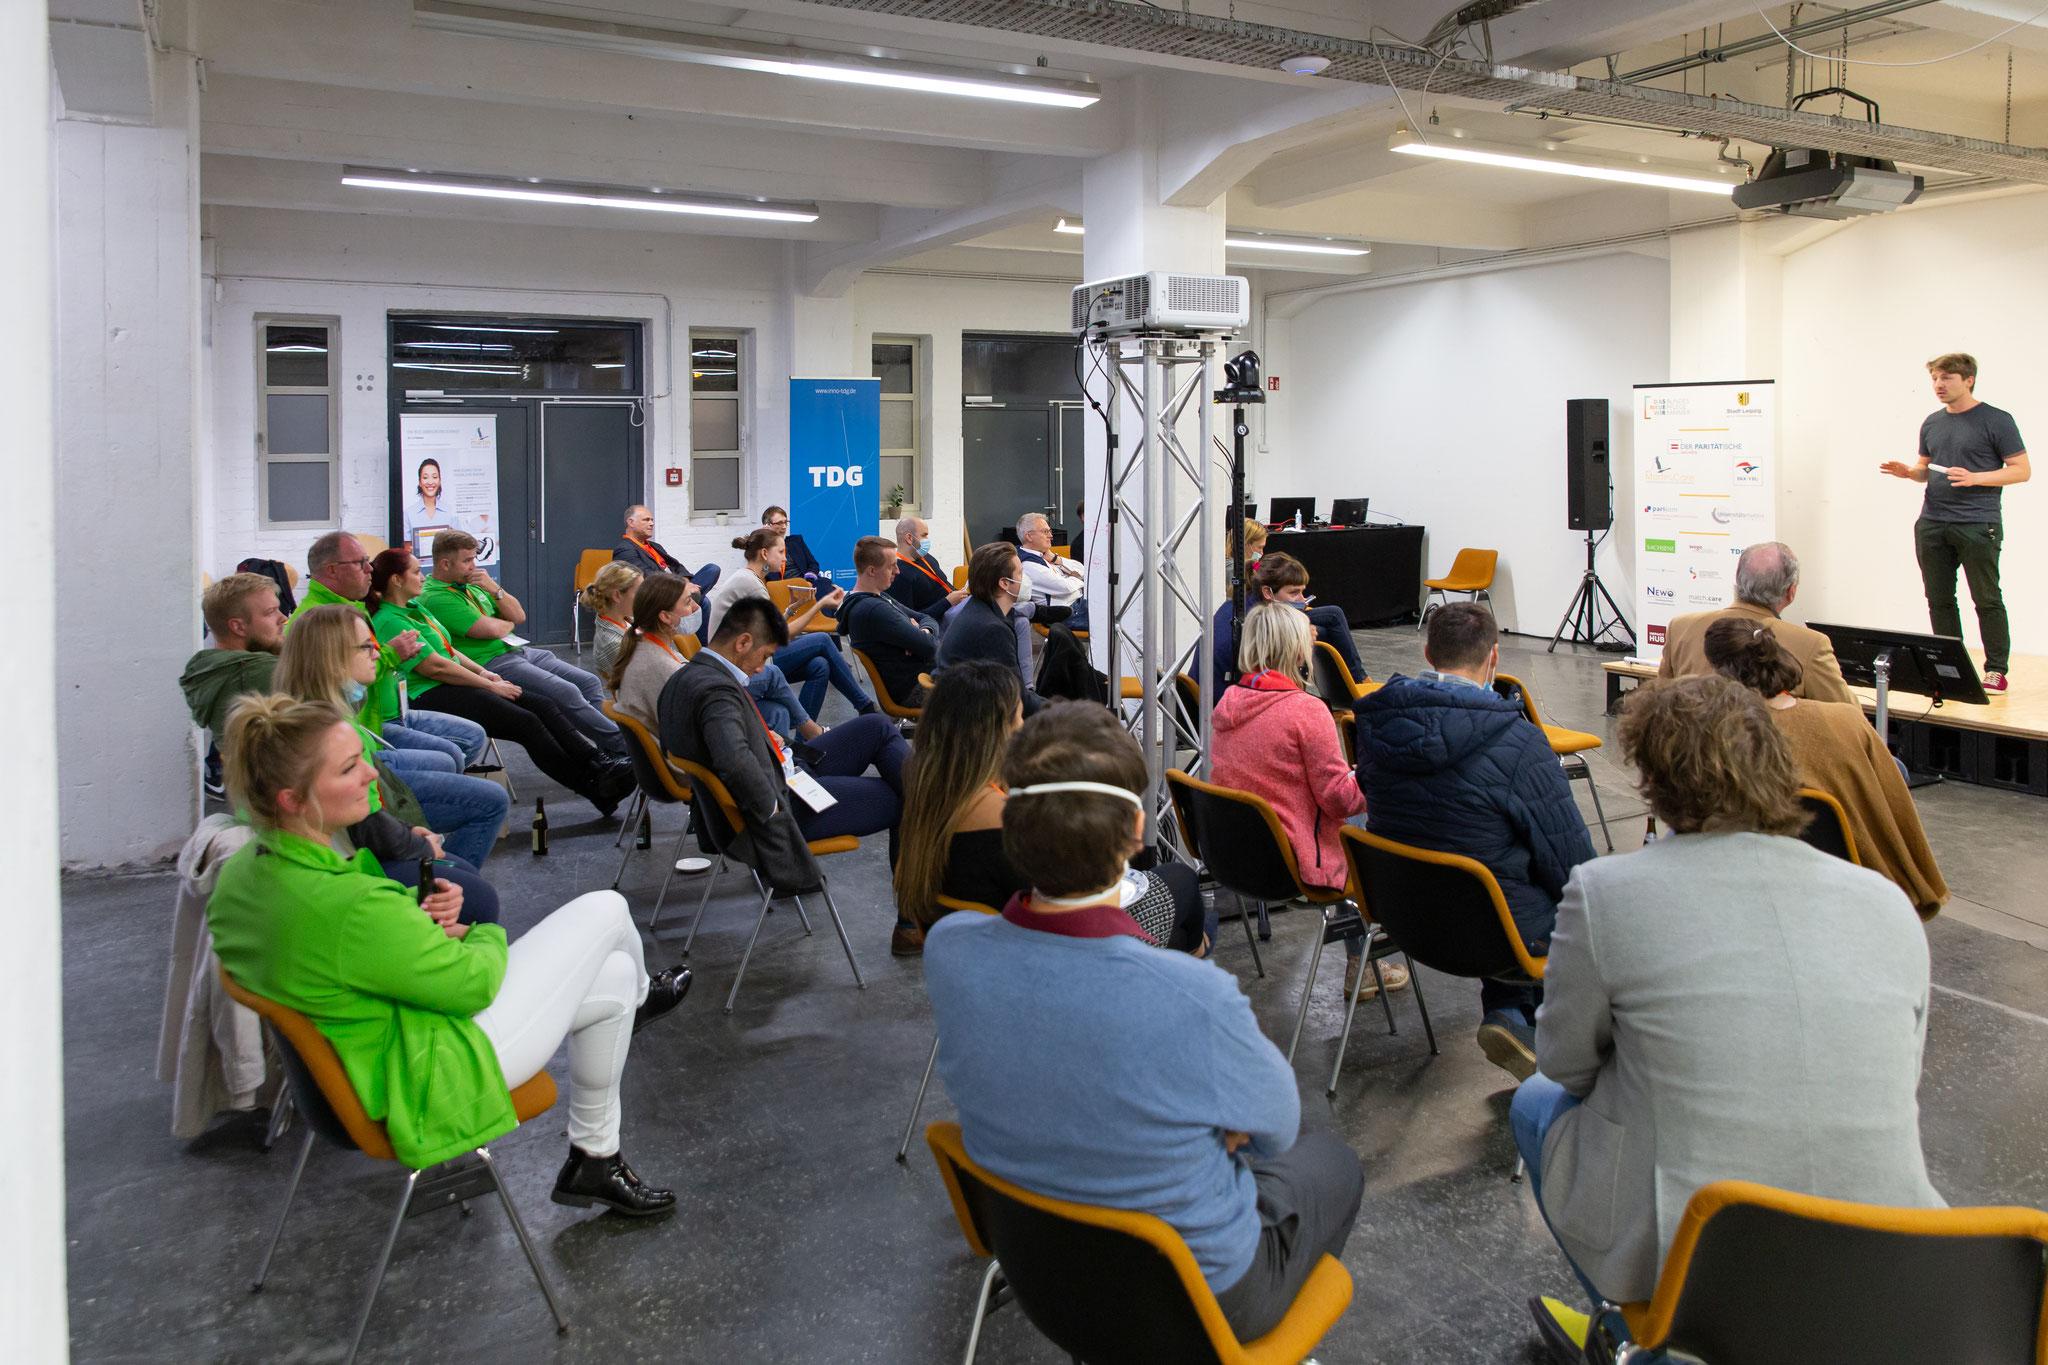 HAP 2020 - Ansprache durch Martin Jähnert